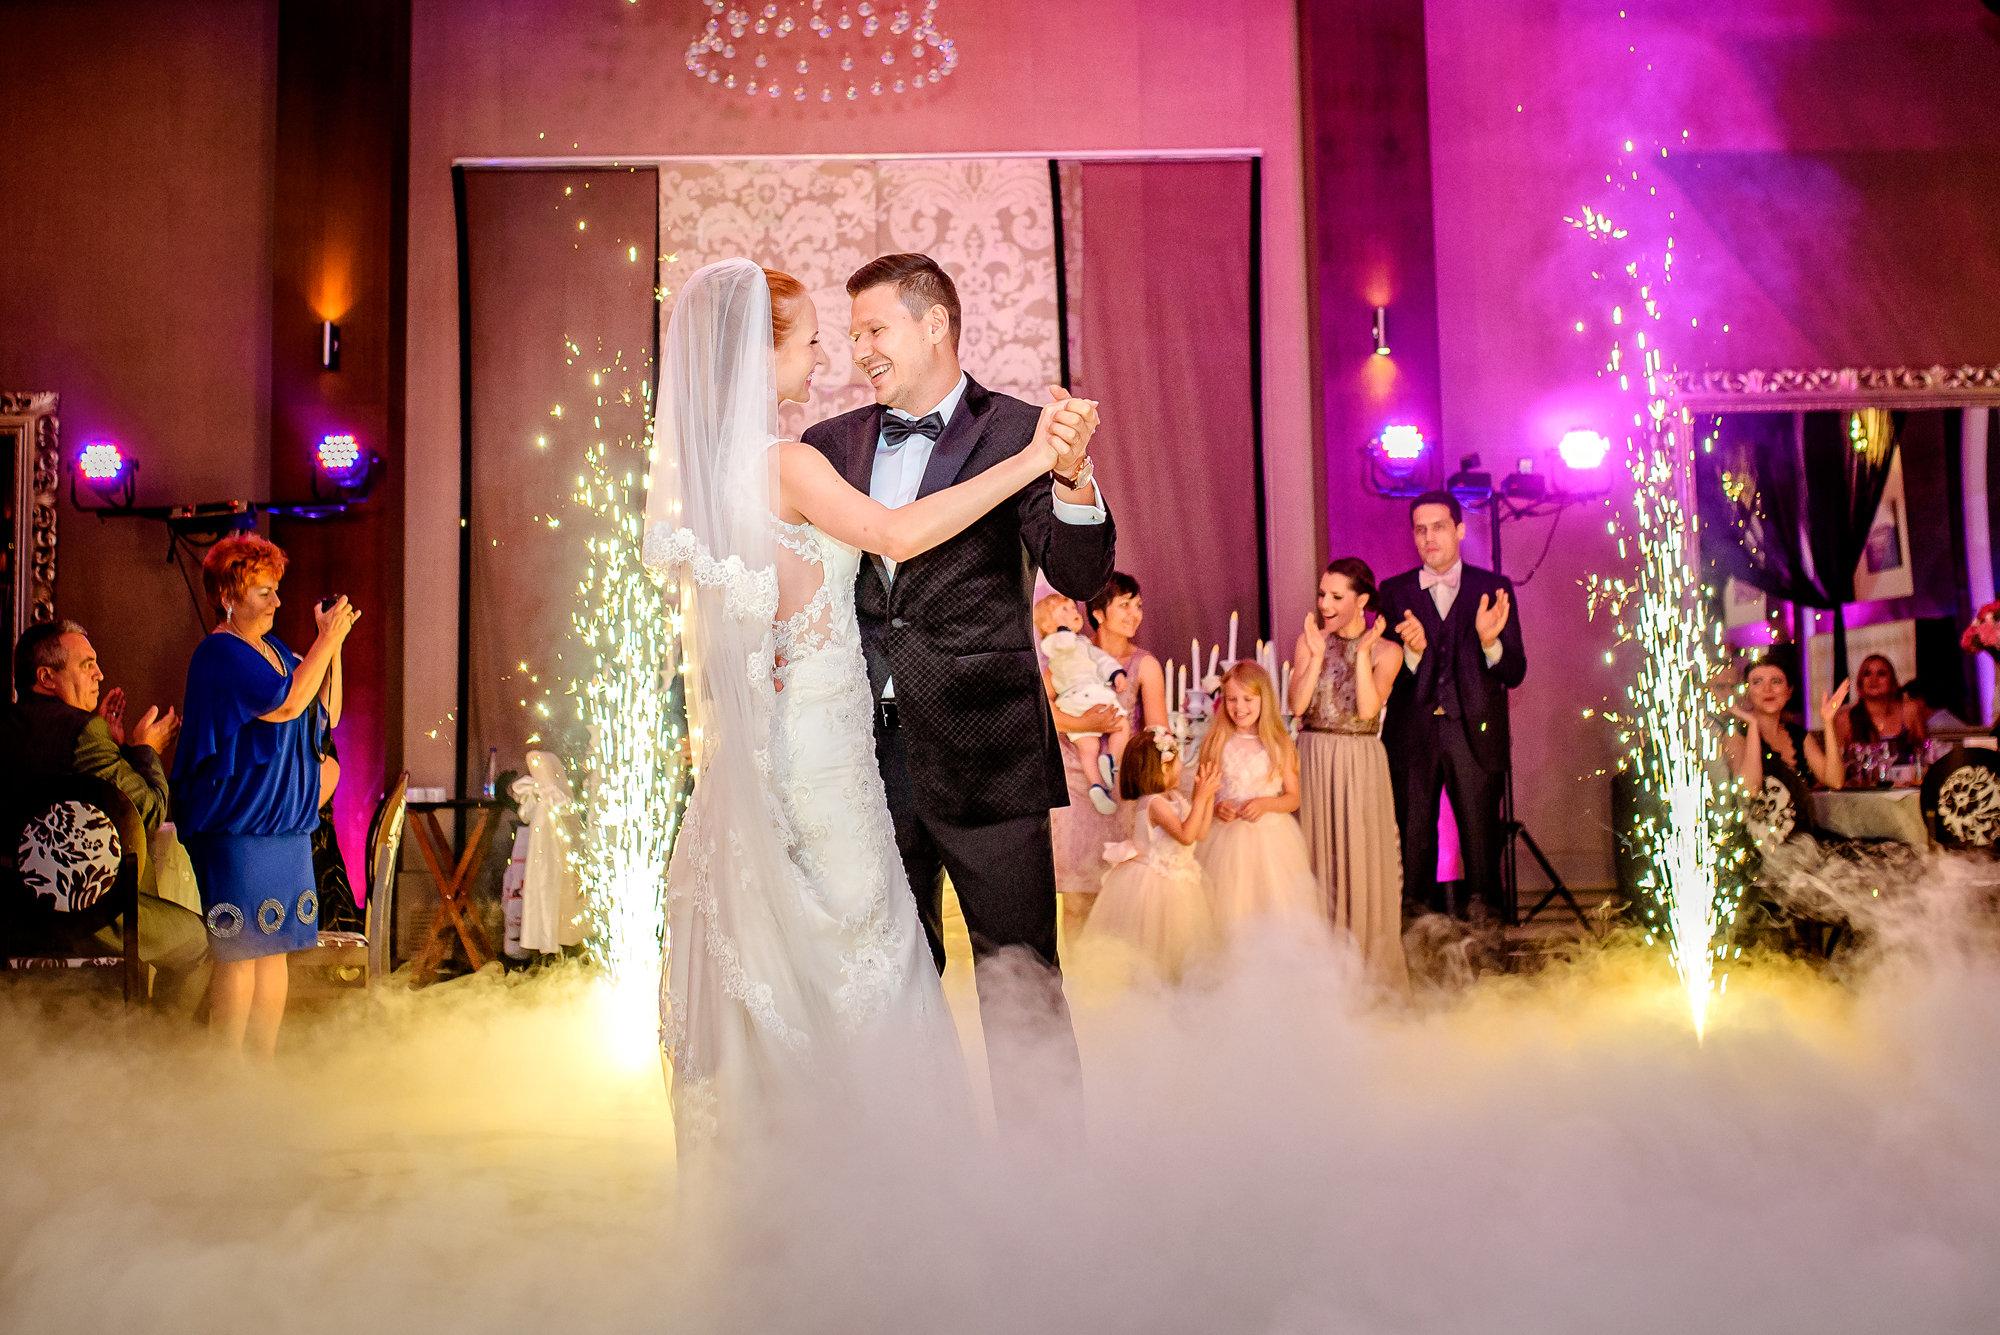 alexandru madalina wedding day 45